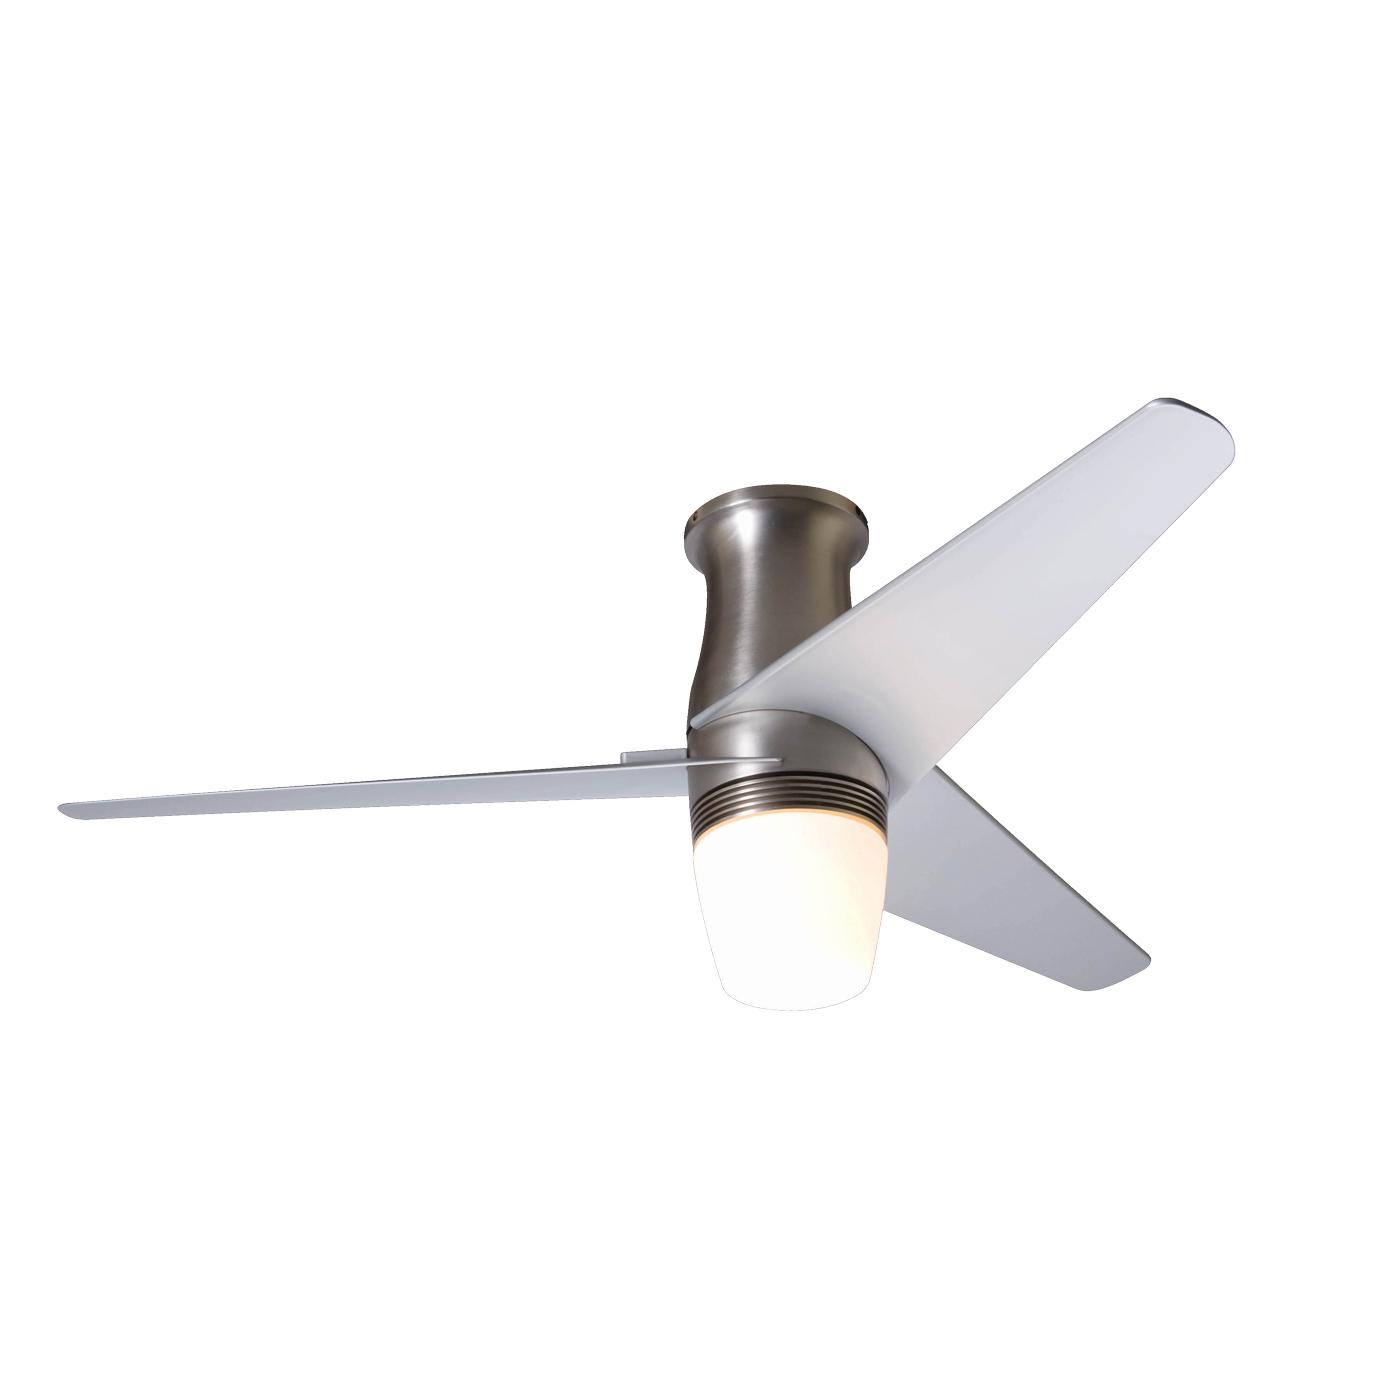 Velo Hugger Ceiling Fan Optional Light The Modern Fan Company Design Is This